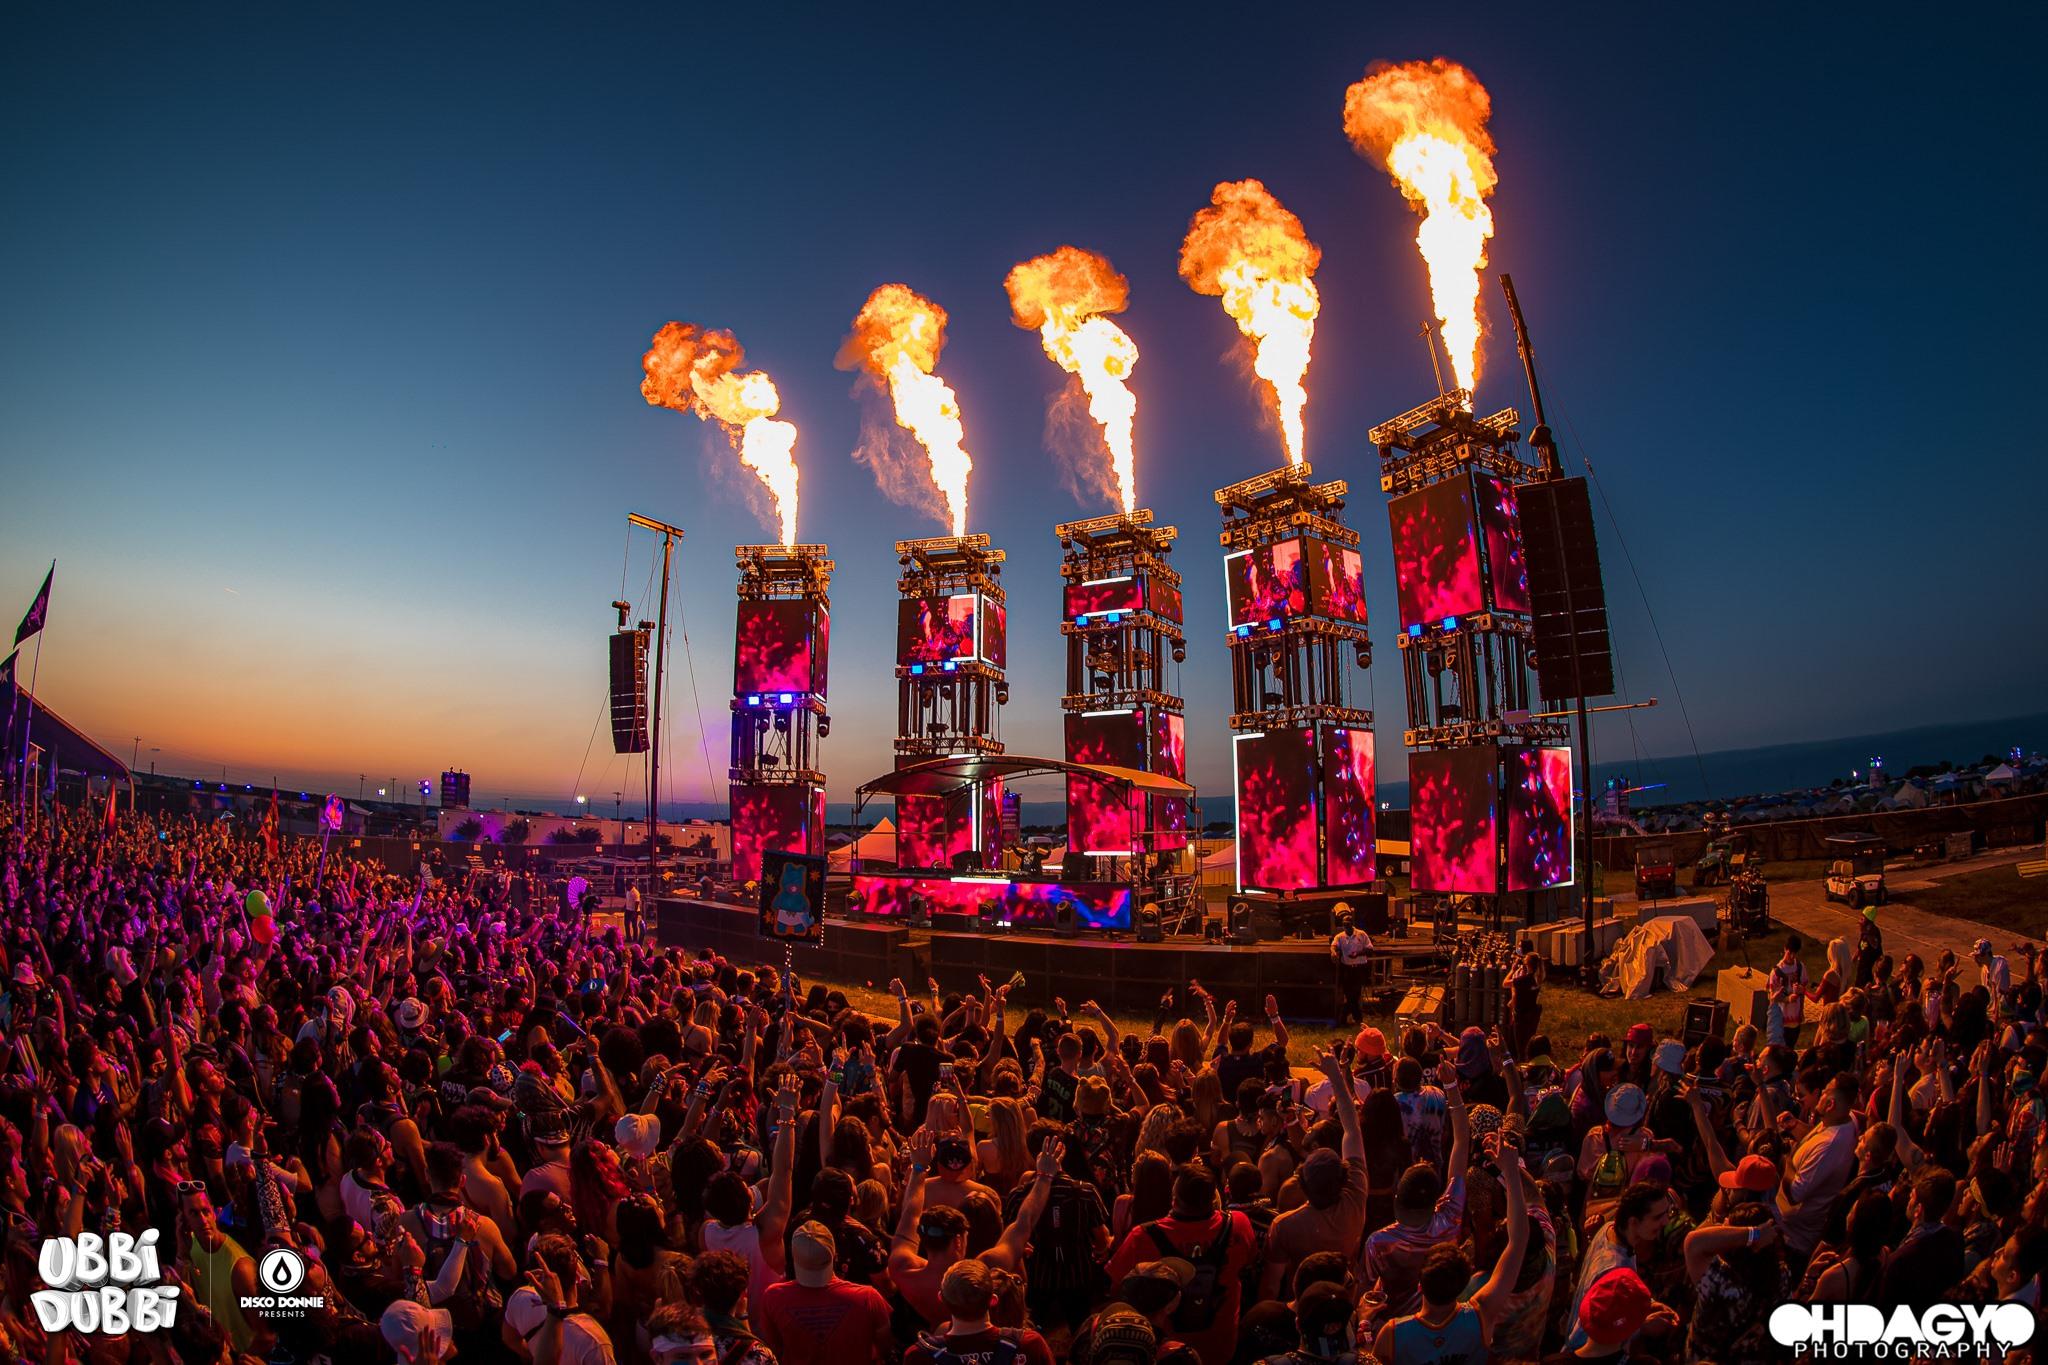 Ubbi Dubbi EDM Festival Texas 2021